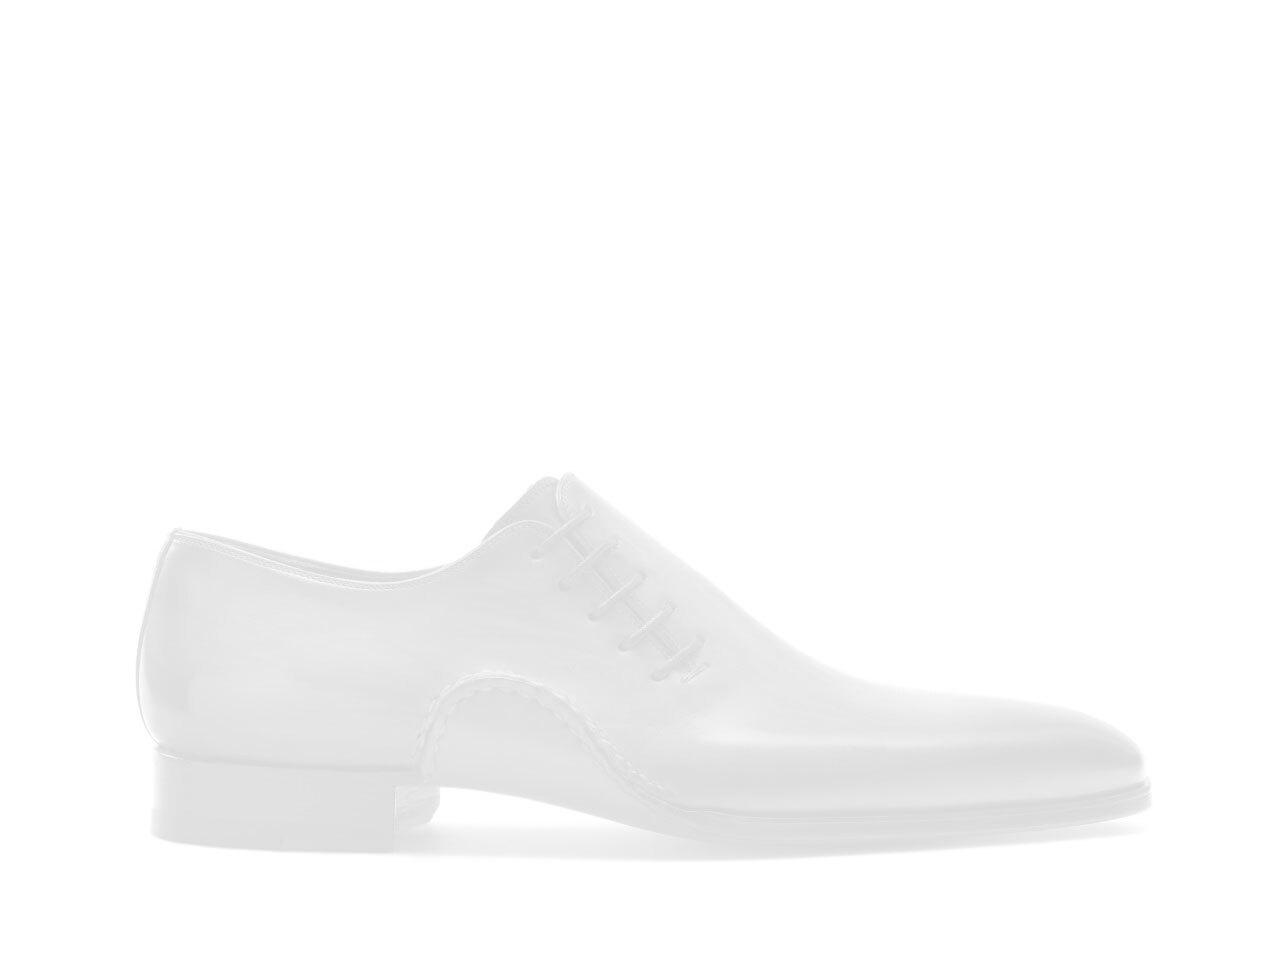 Sole of the Magnanni Garrett Cuero Men's Double Monk Strap Shoes